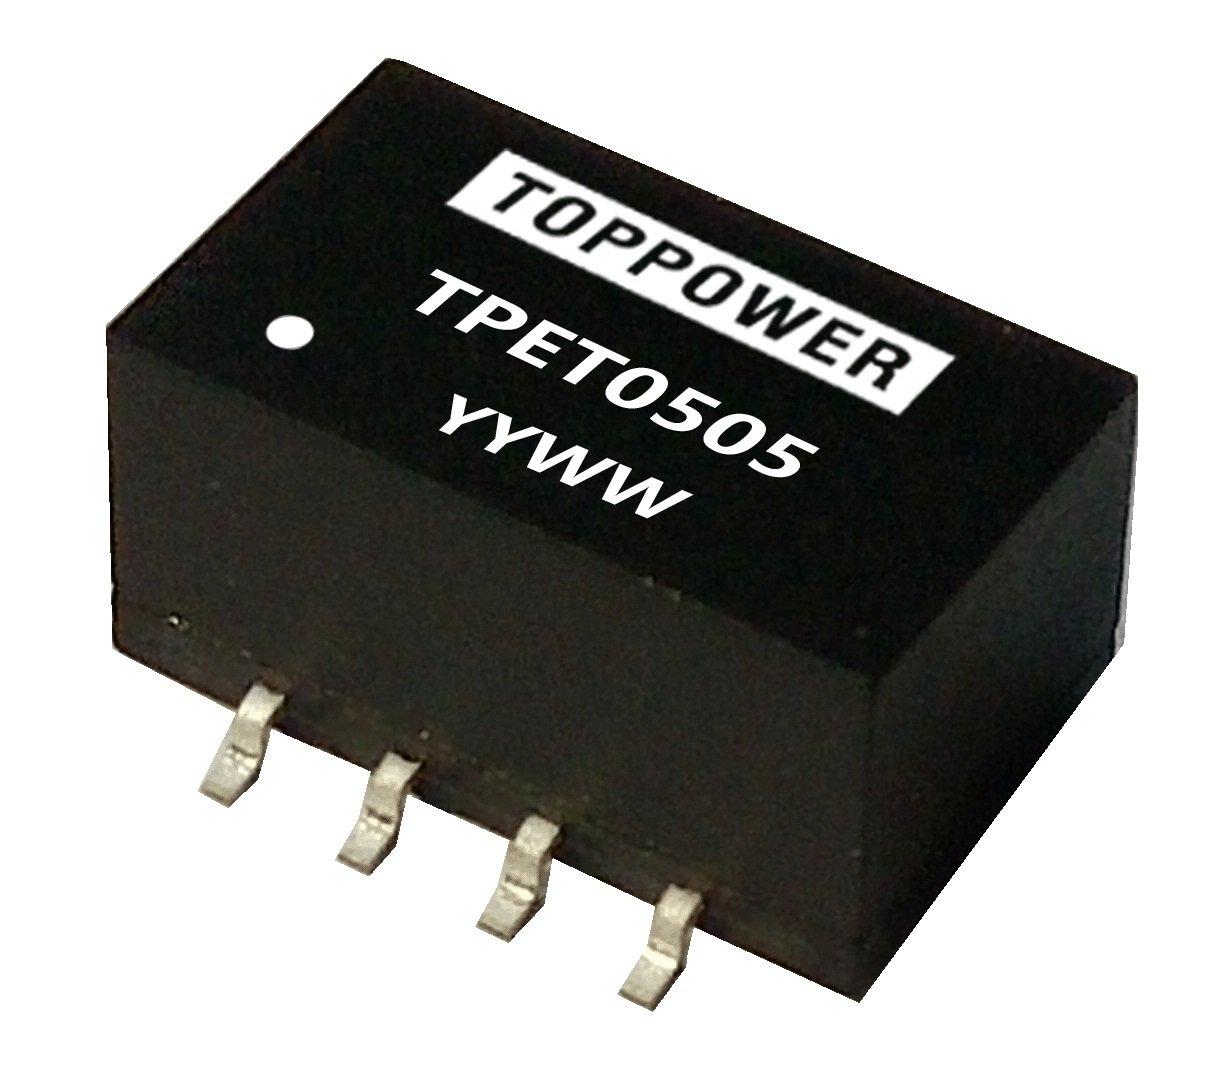 1- TPET0505